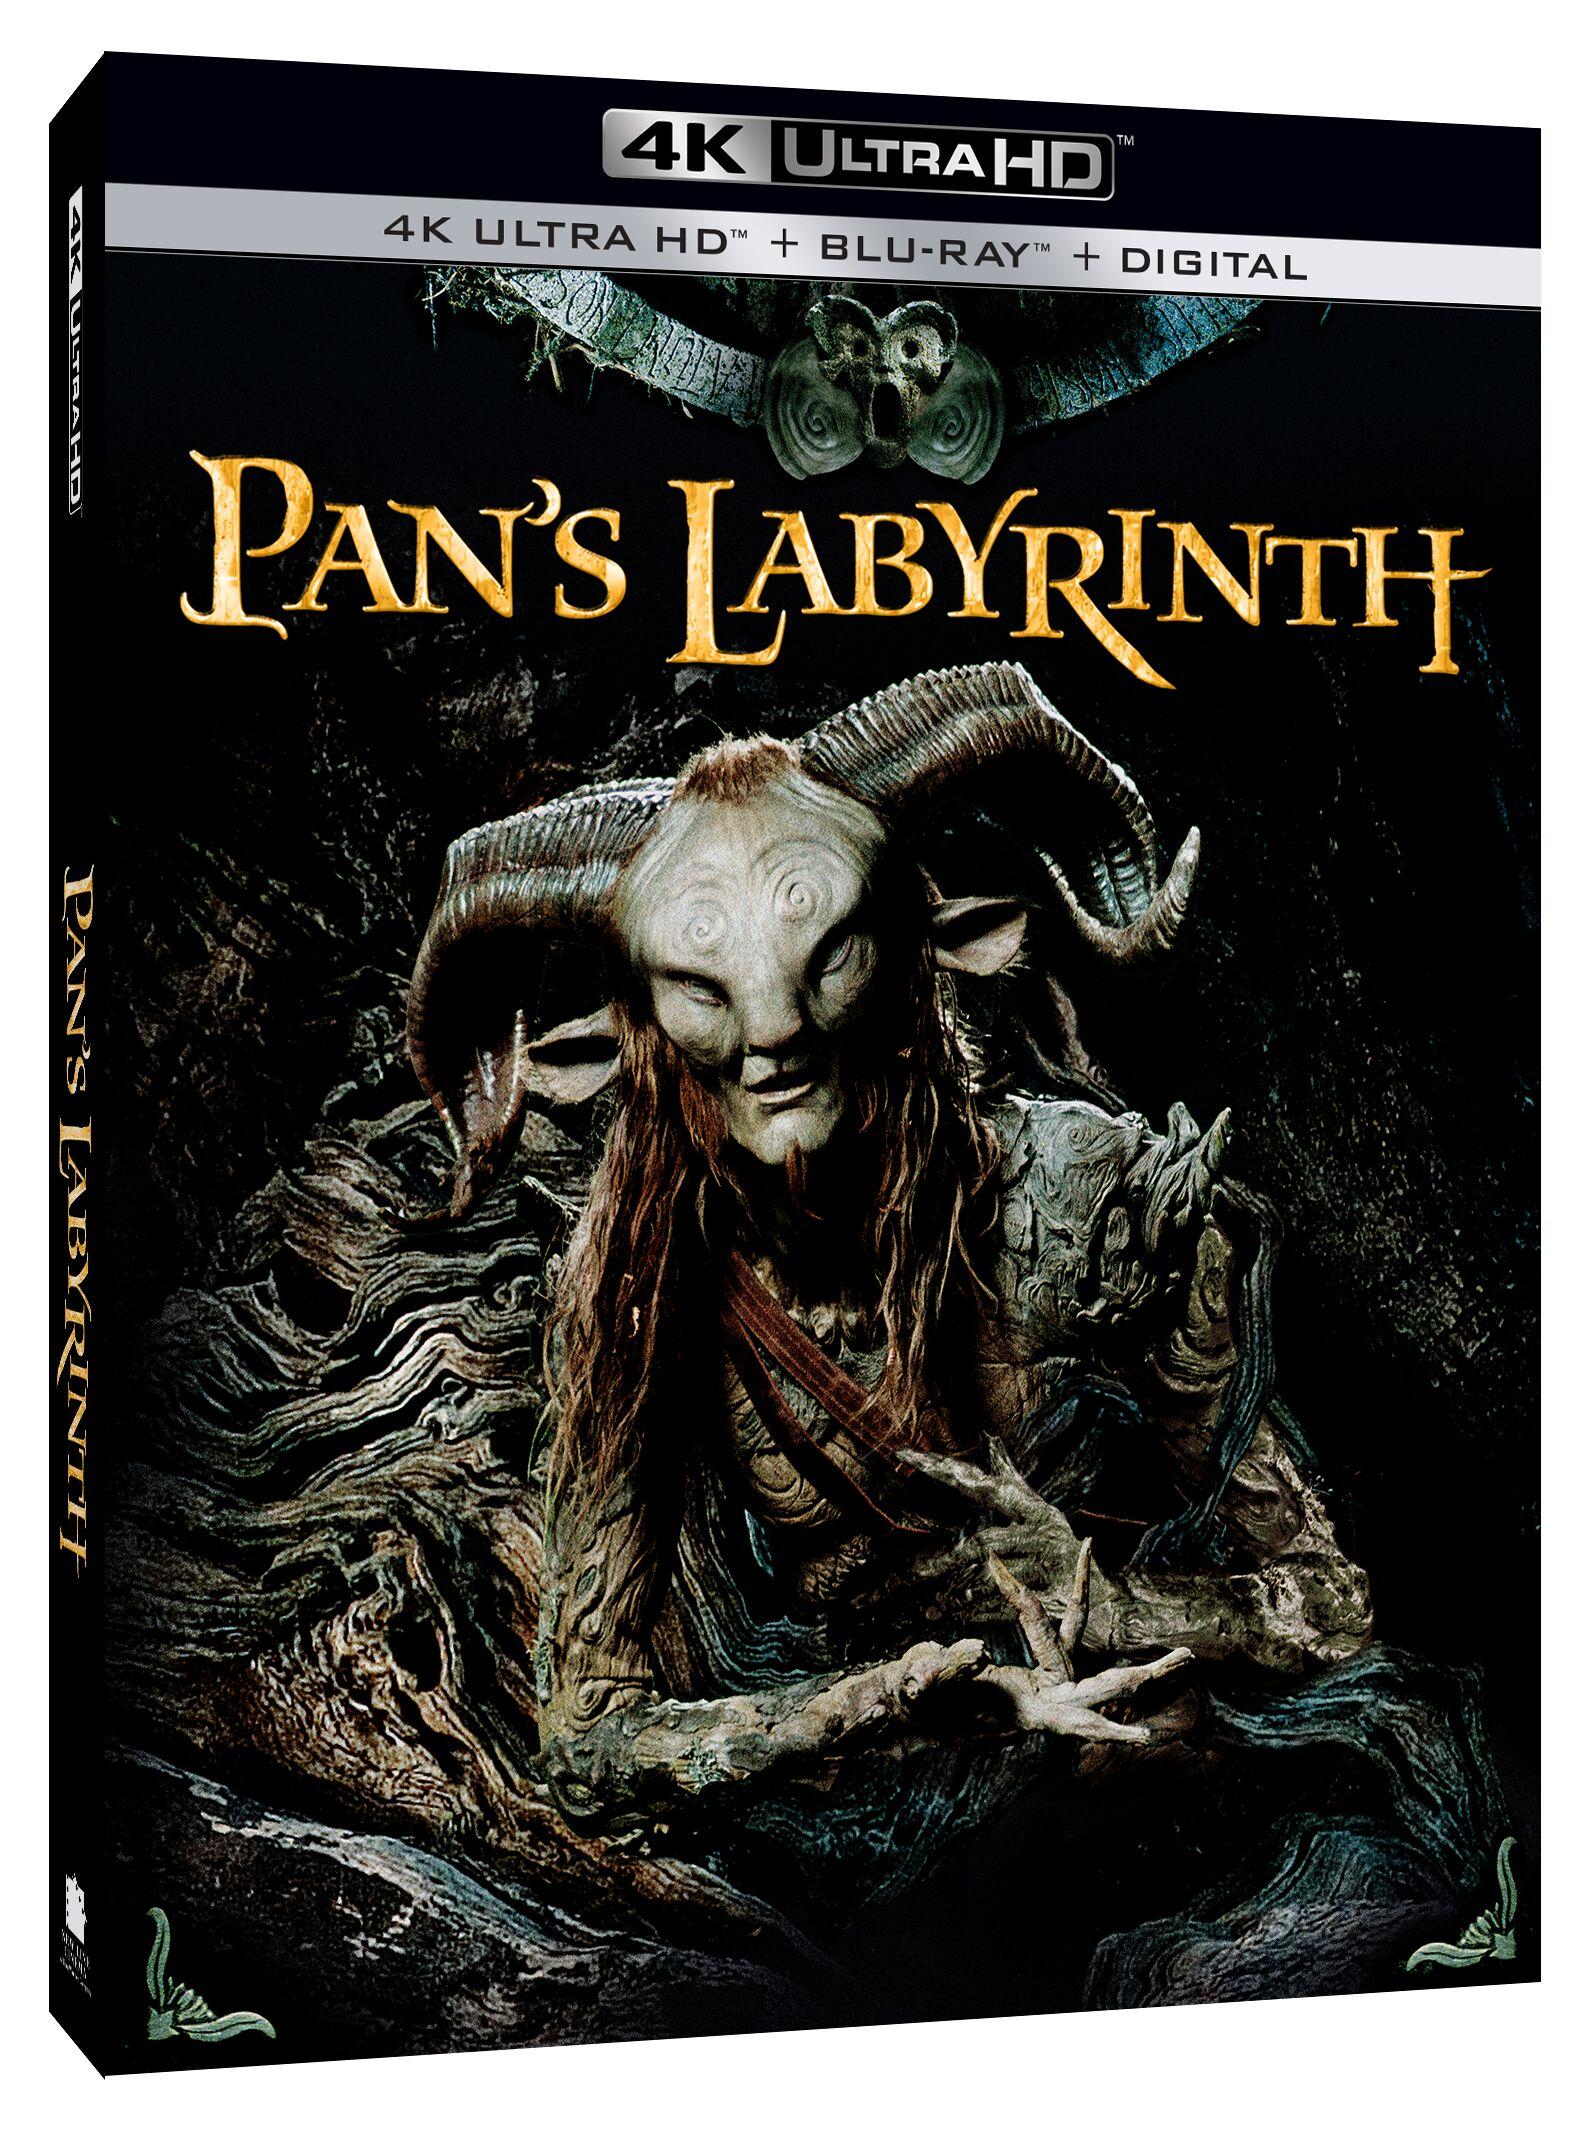 Pan's Labyrinth 4k Blu-ray